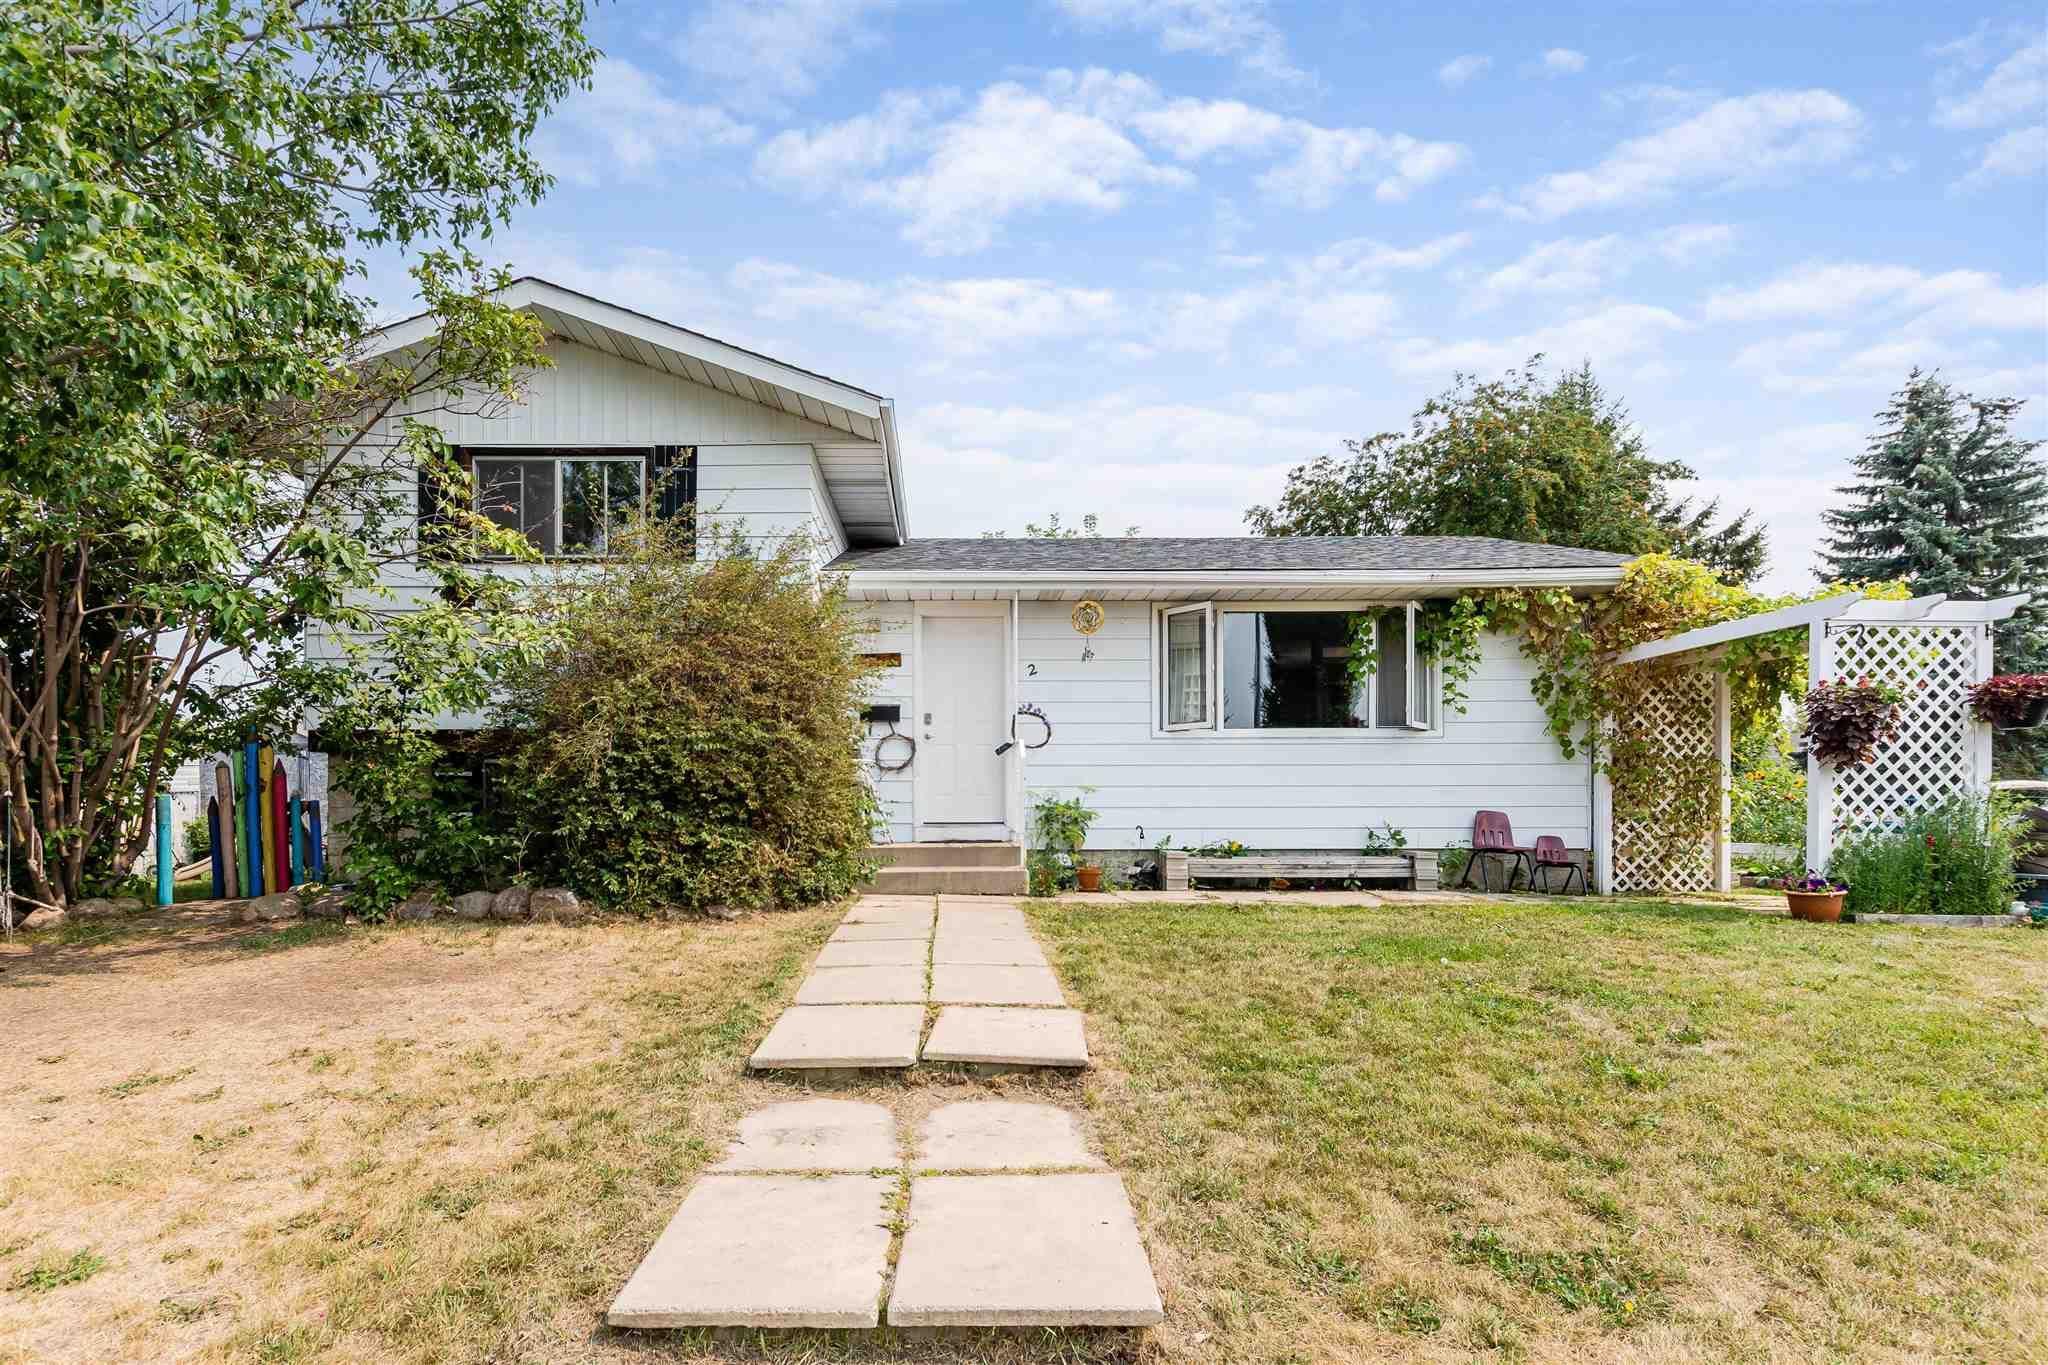 Main Photo: 2 Blairmore Street: Spruce Grove House for sale : MLS®# E4256878